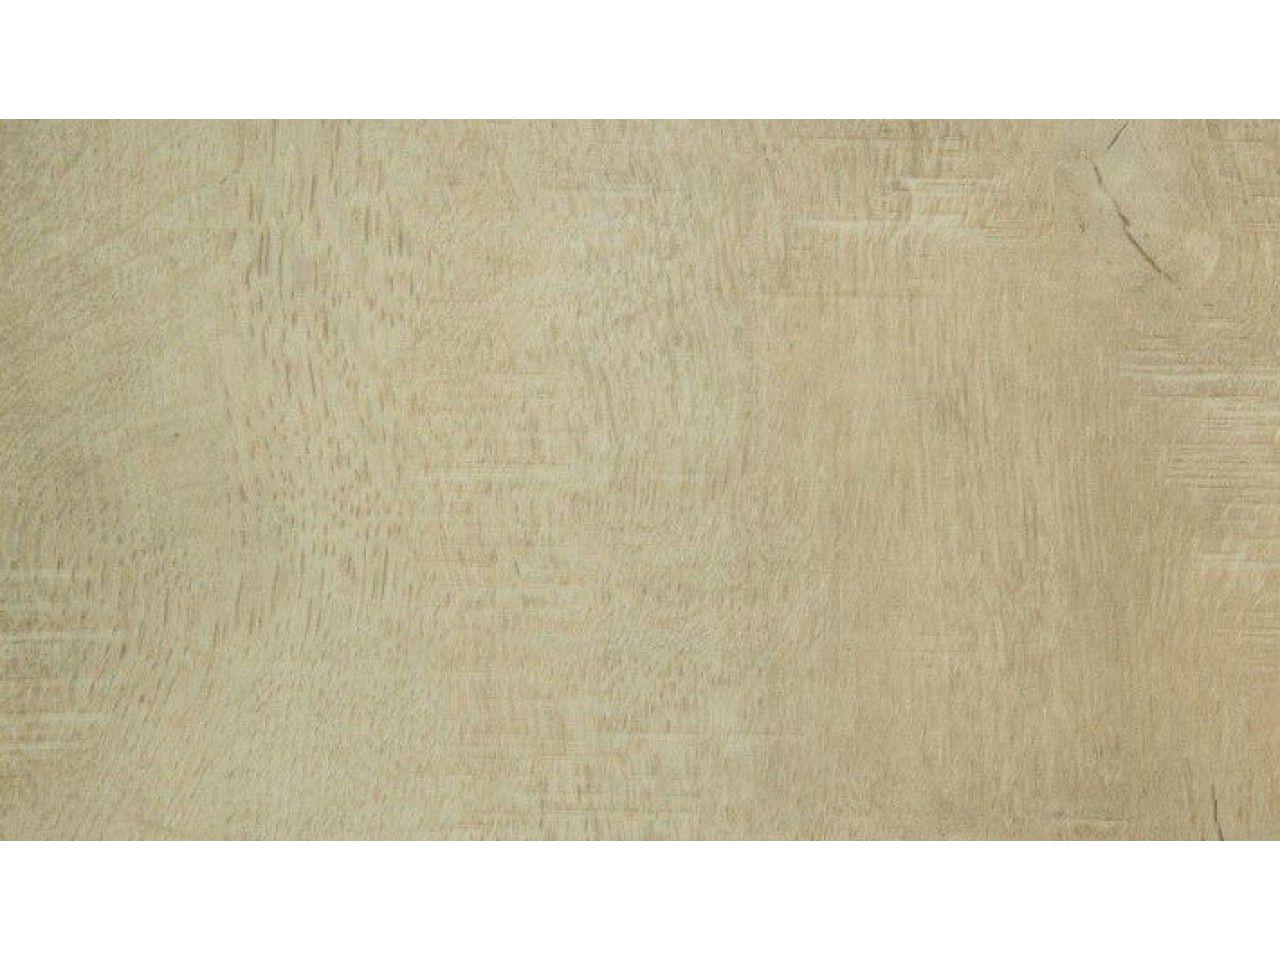 Harmony Lvt Wood Amp Stone Flooring 0 55mm